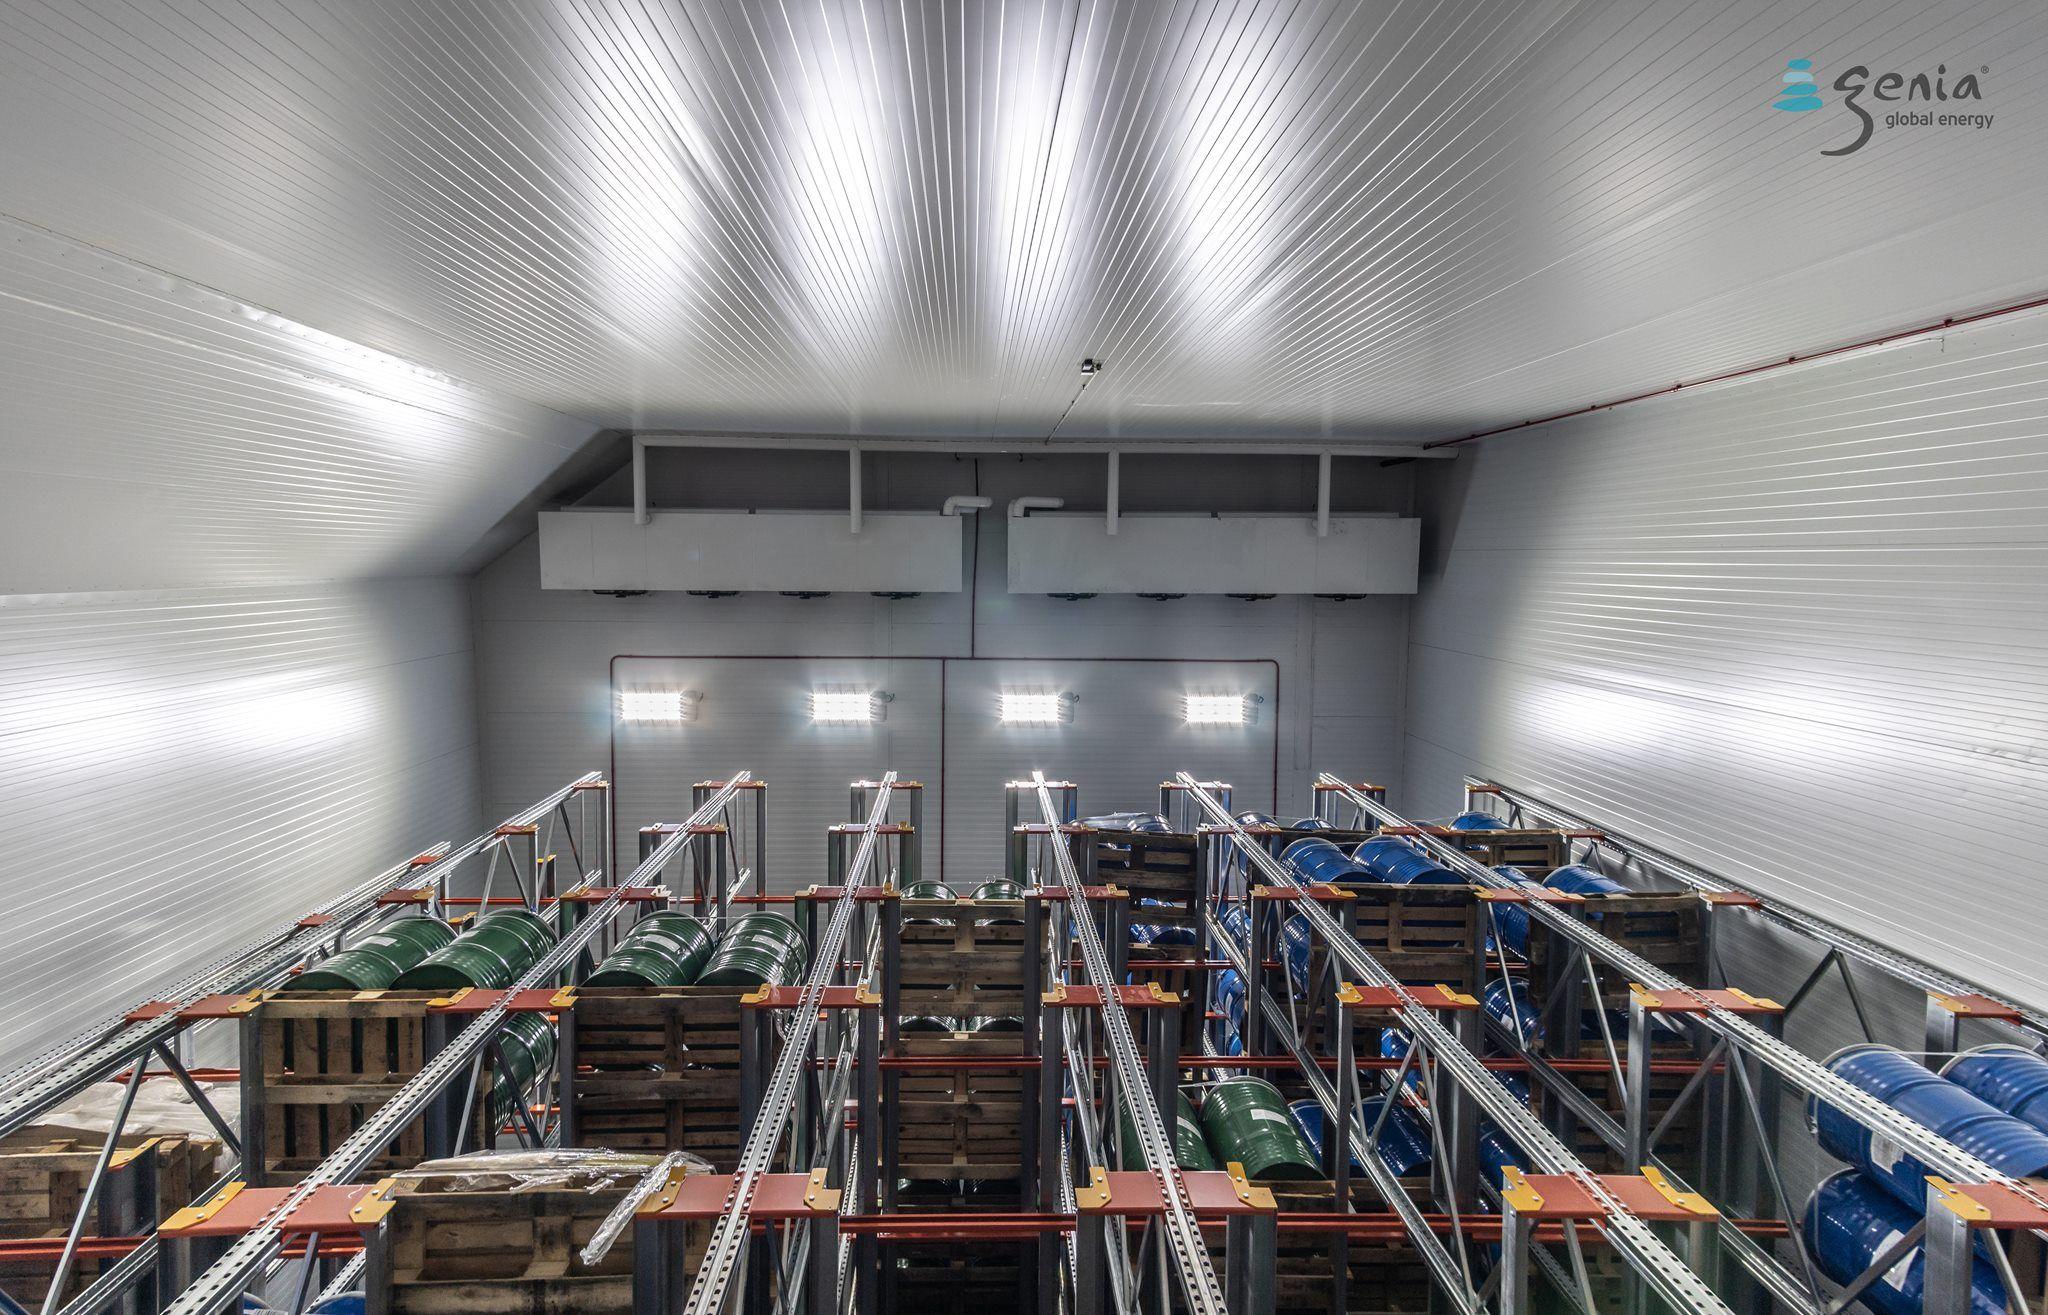 camaras-congelacion-iluminacion-led-inteligente-14-metros-altura